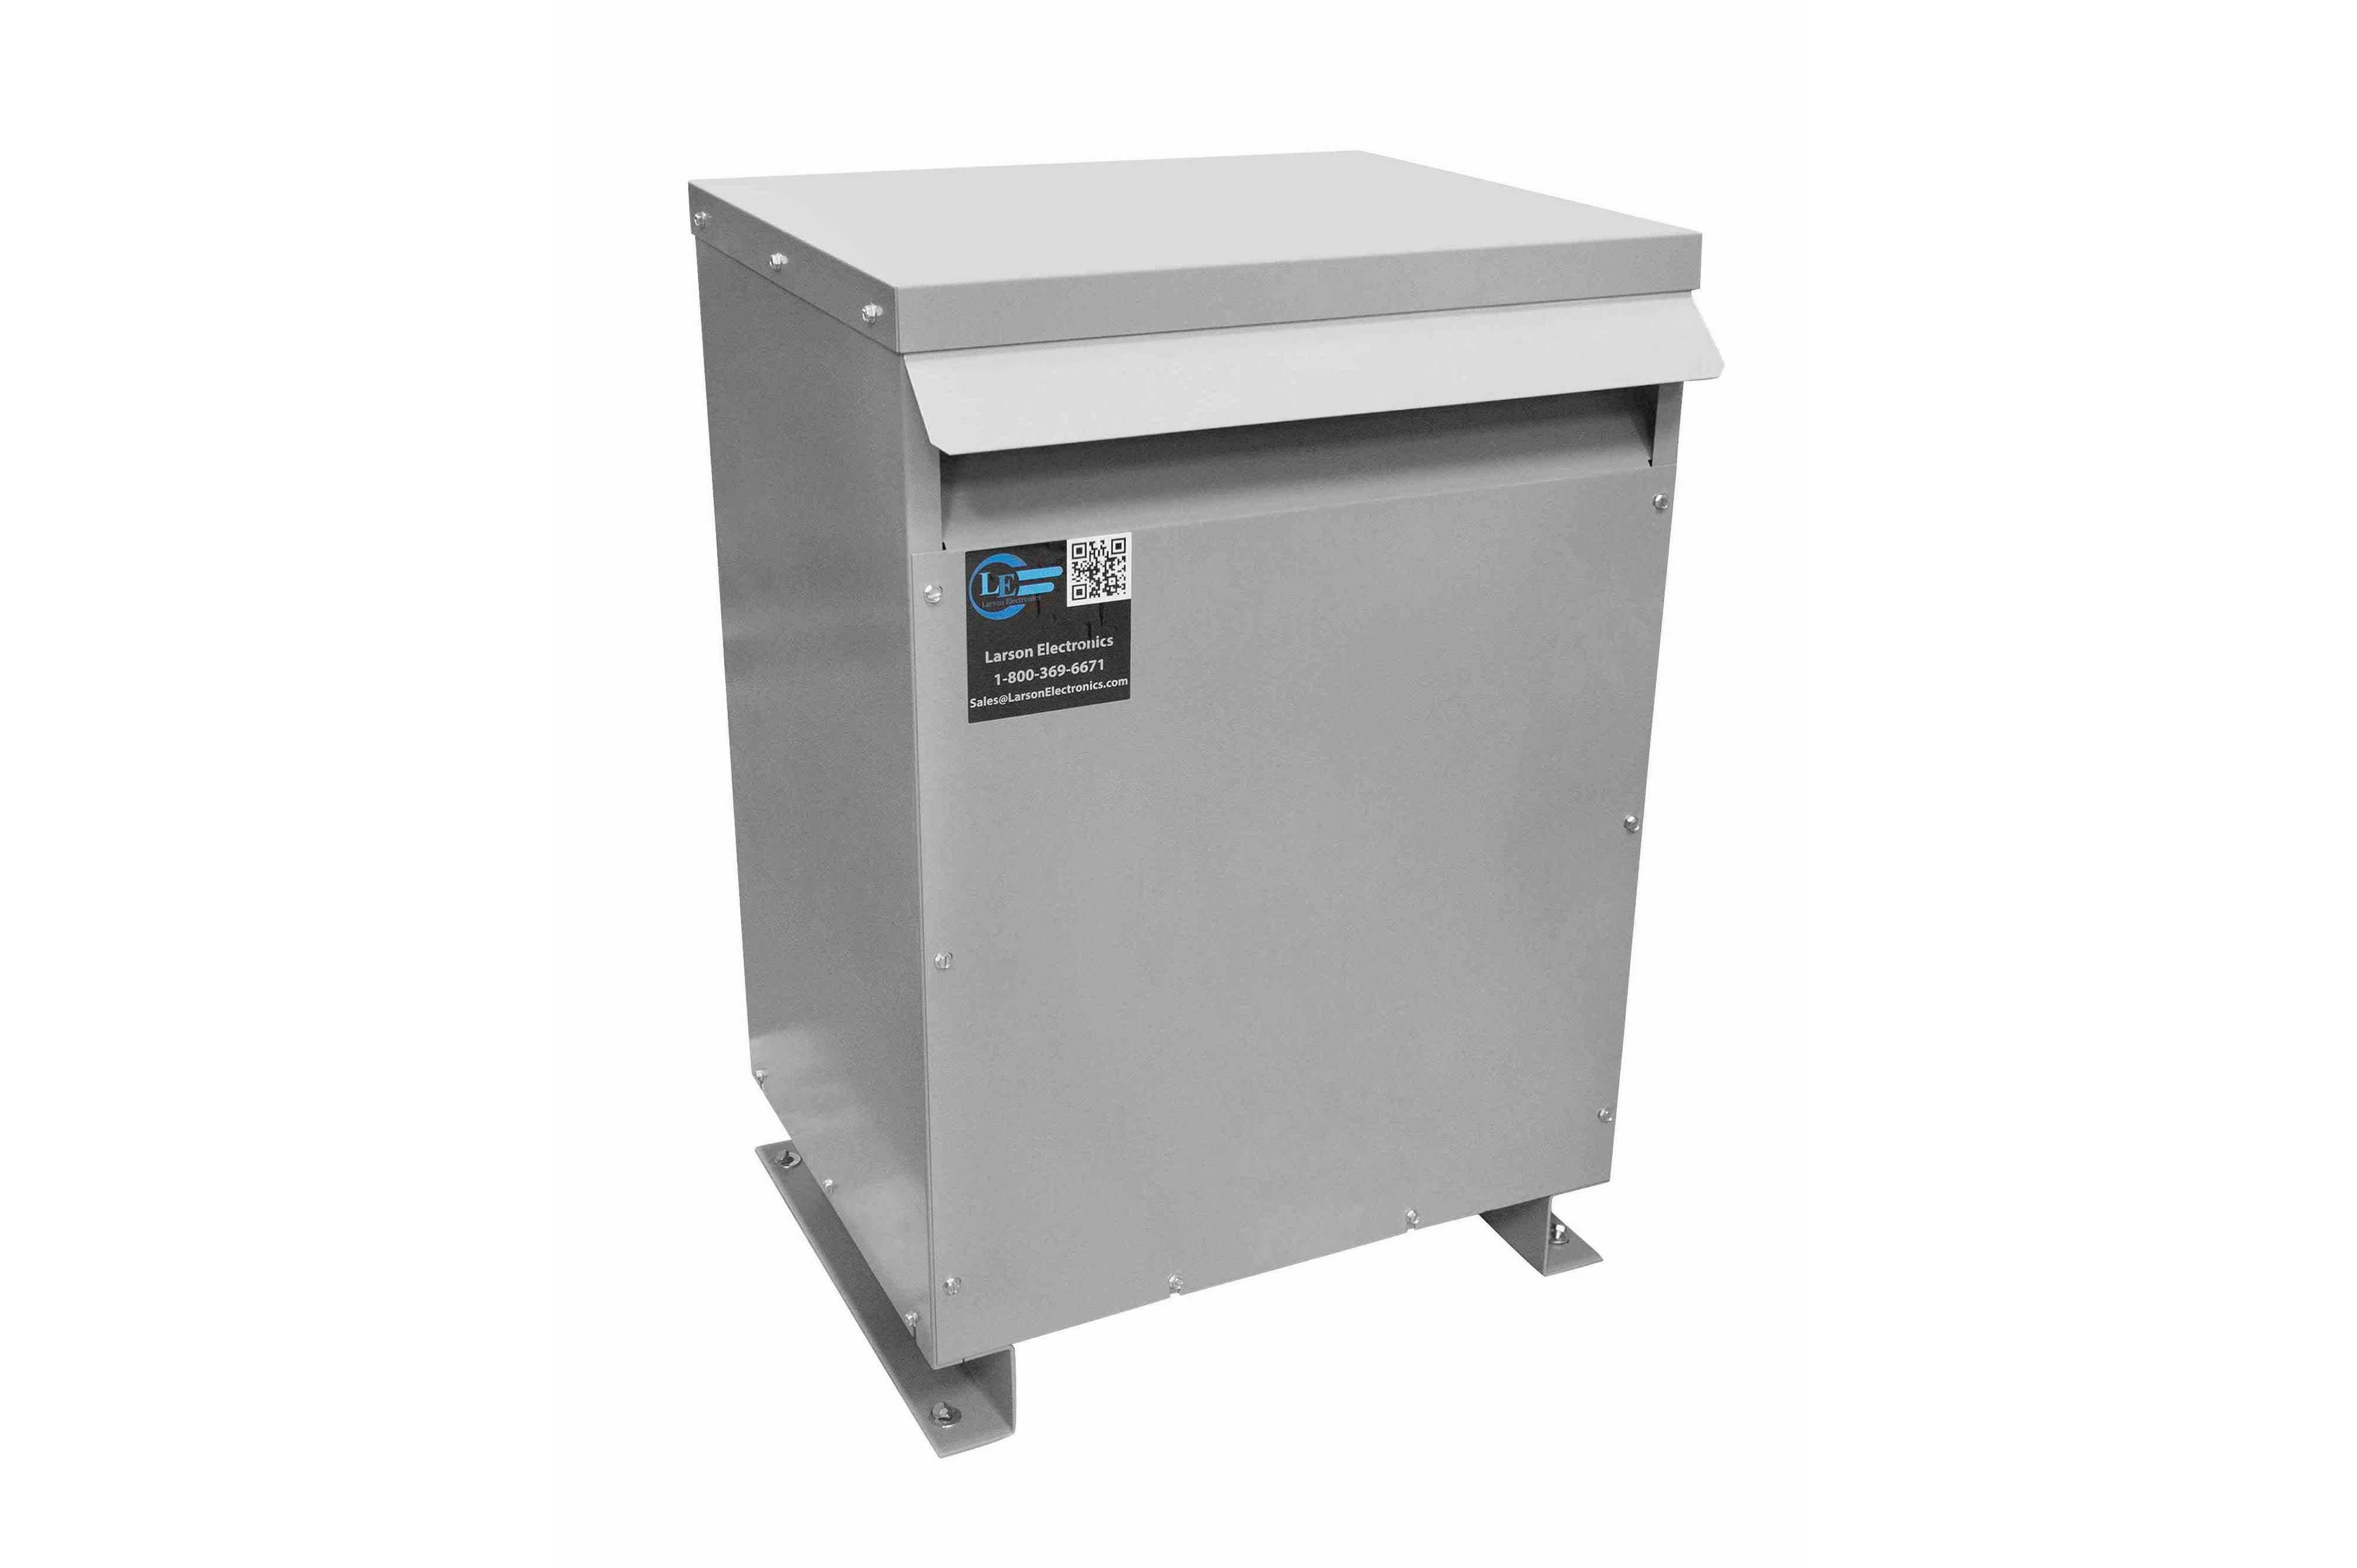 60 kVA 3PH DOE Transformer, 240V Delta Primary, 208Y/120 Wye-N Secondary, N3R, Ventilated, 60 Hz